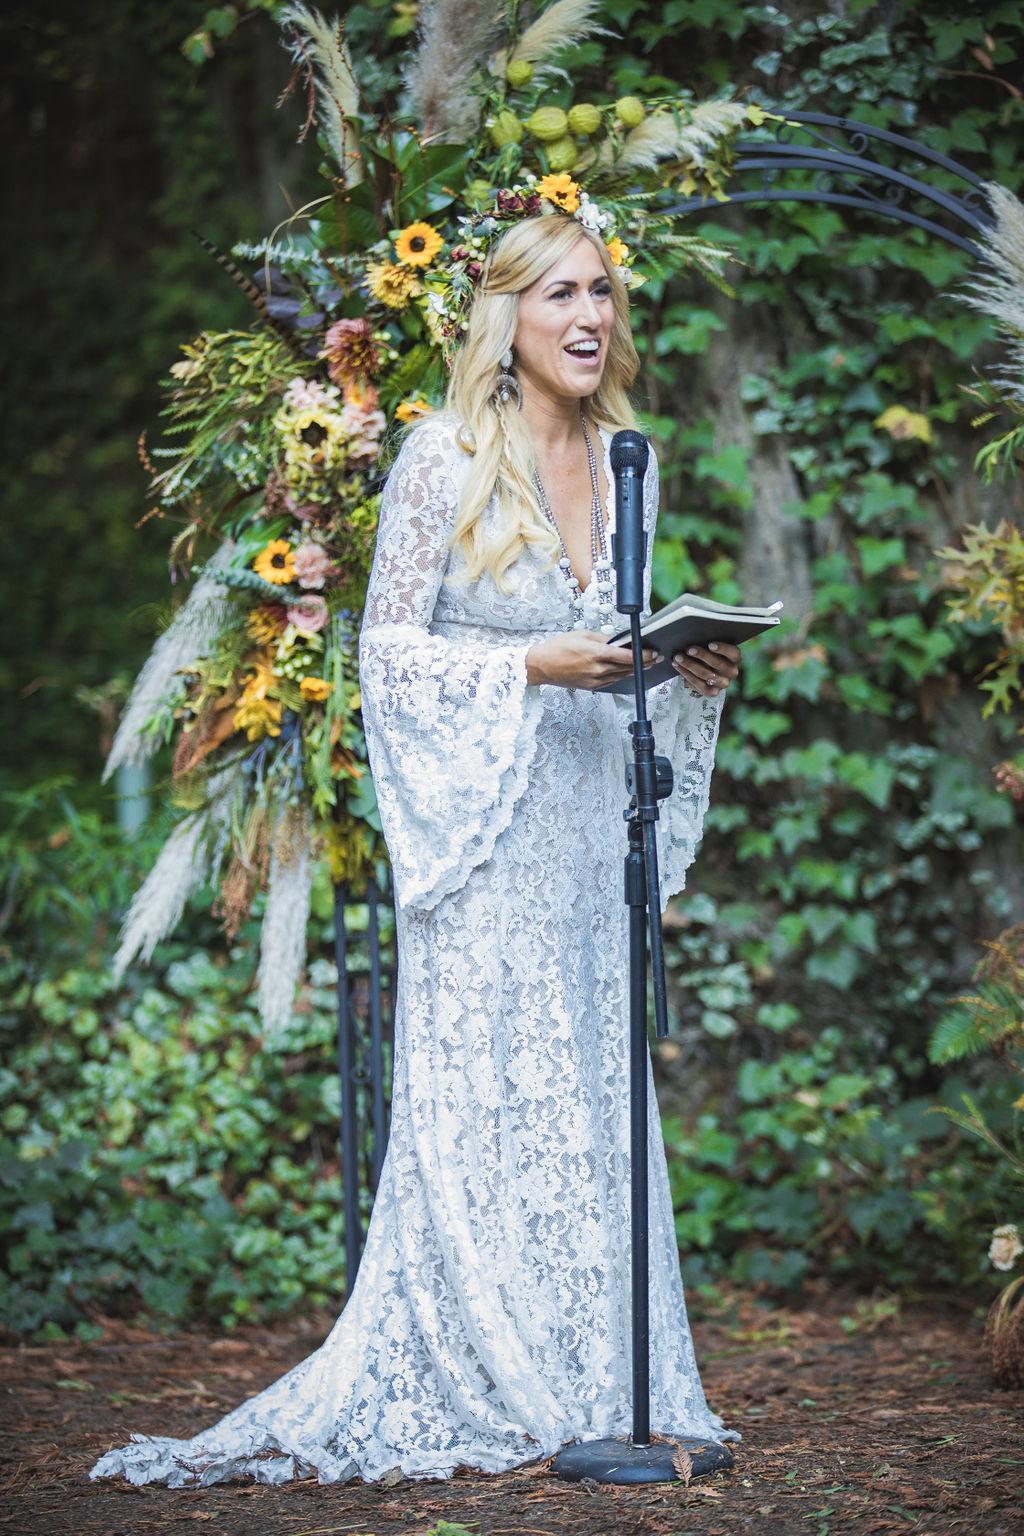 bride wedding vows altar floral florist bloom